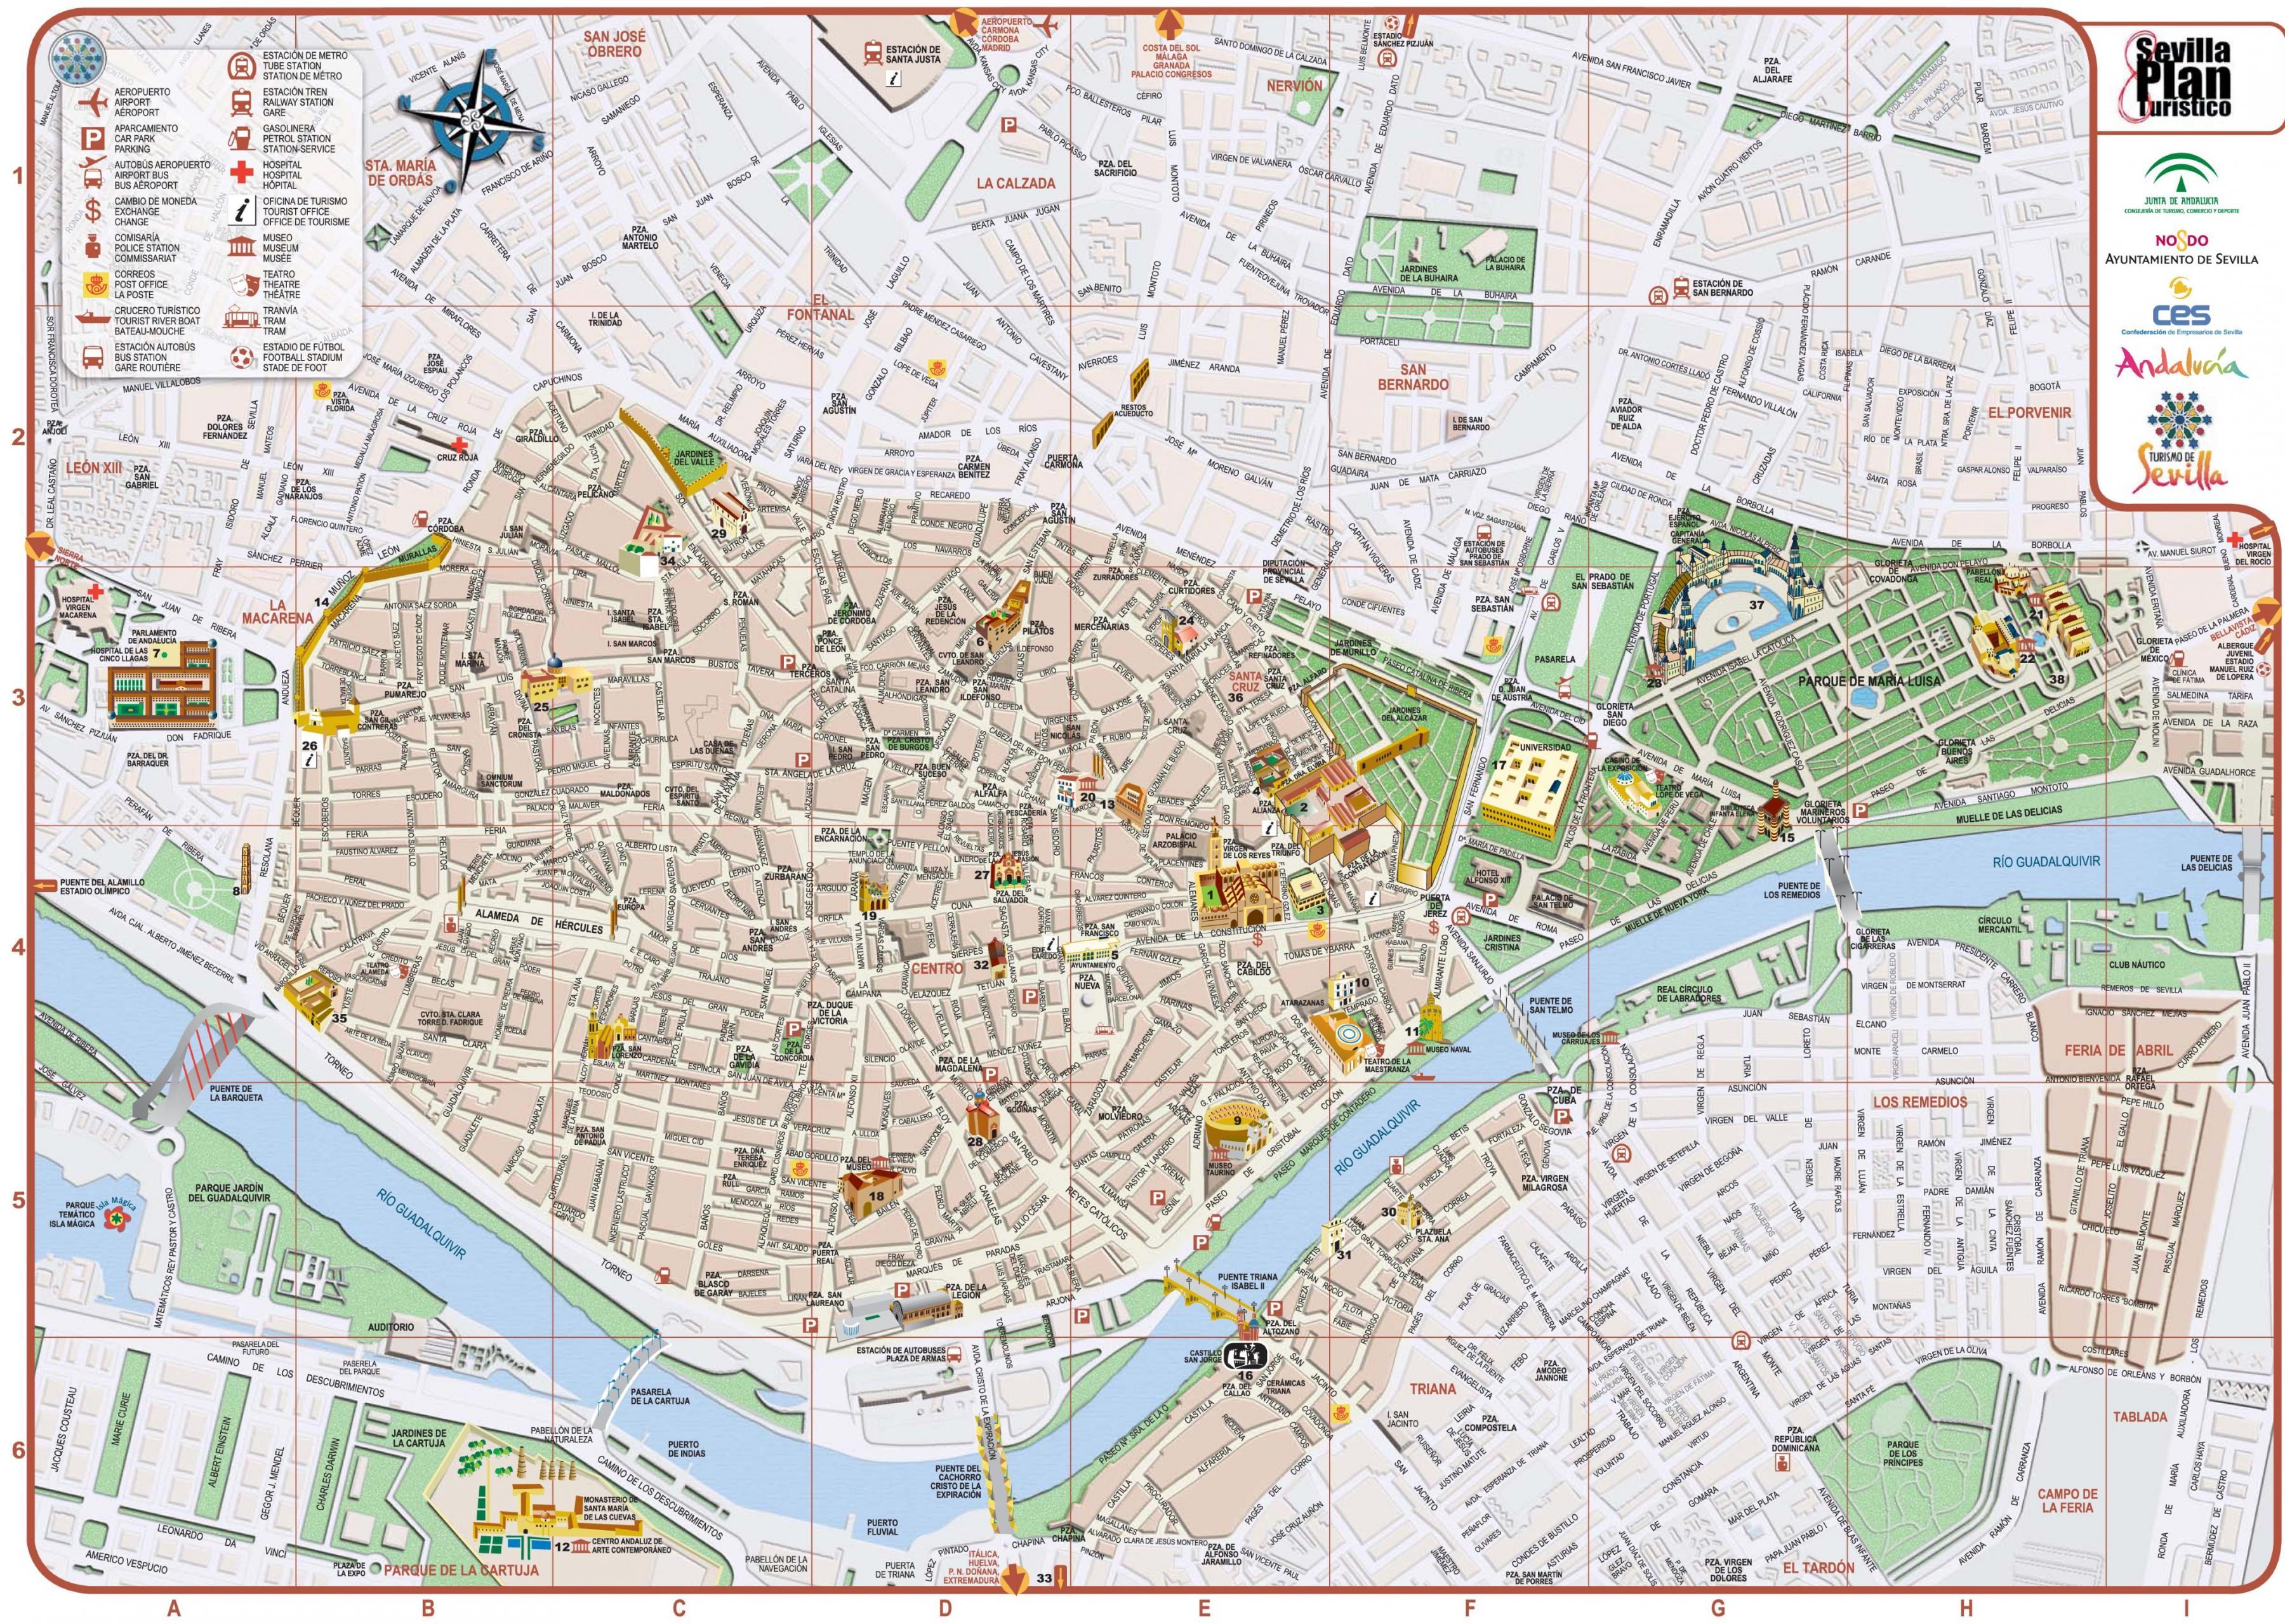 Sevilla city map - Stadtplan von Sevilla in Spanien ...